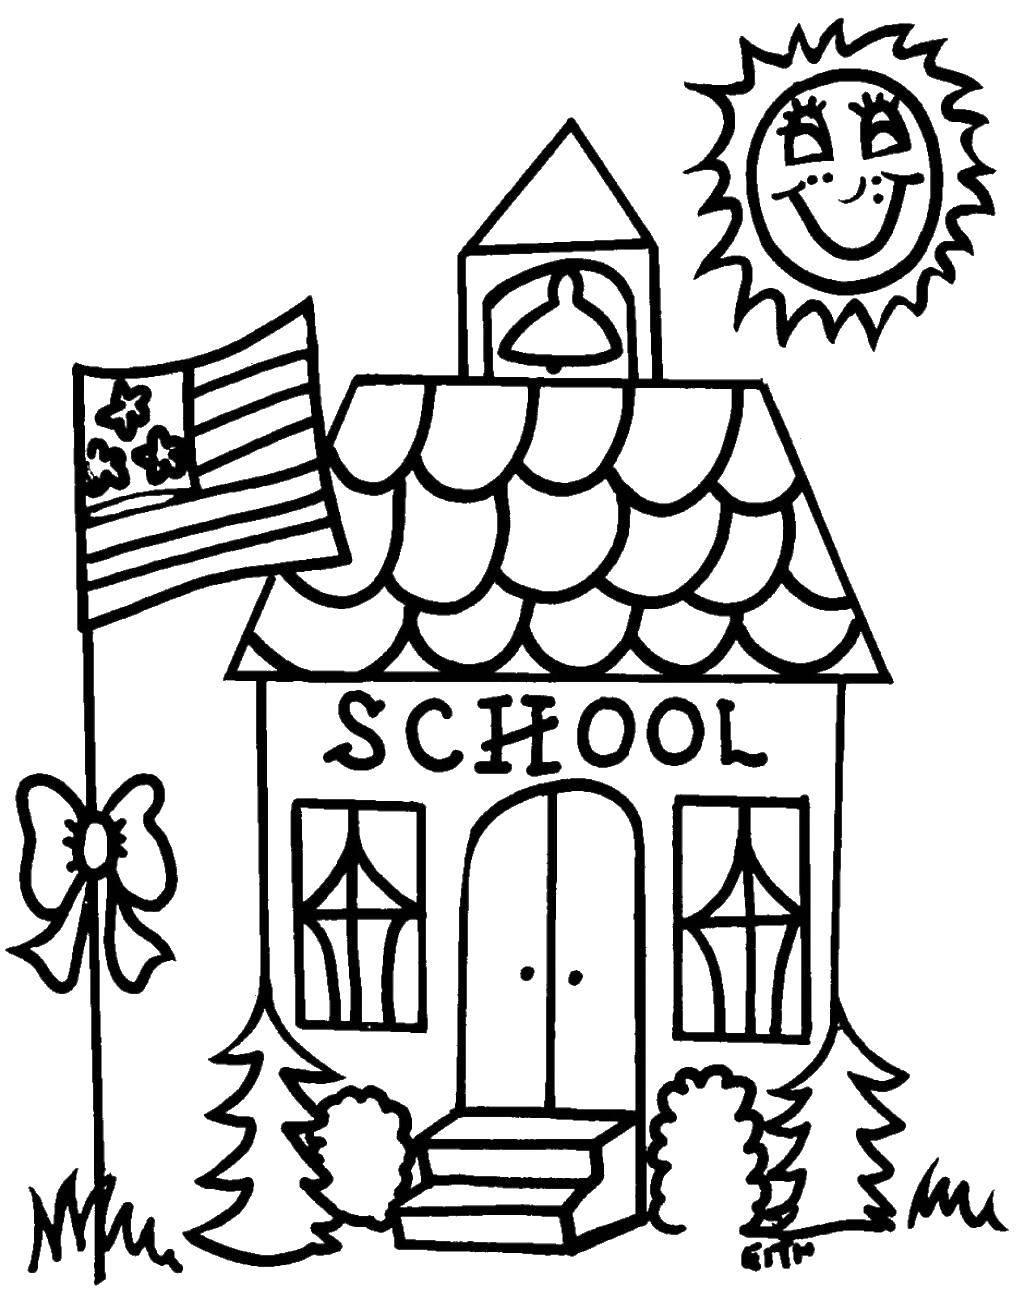 Coloring sheet school supplies Download .  Print